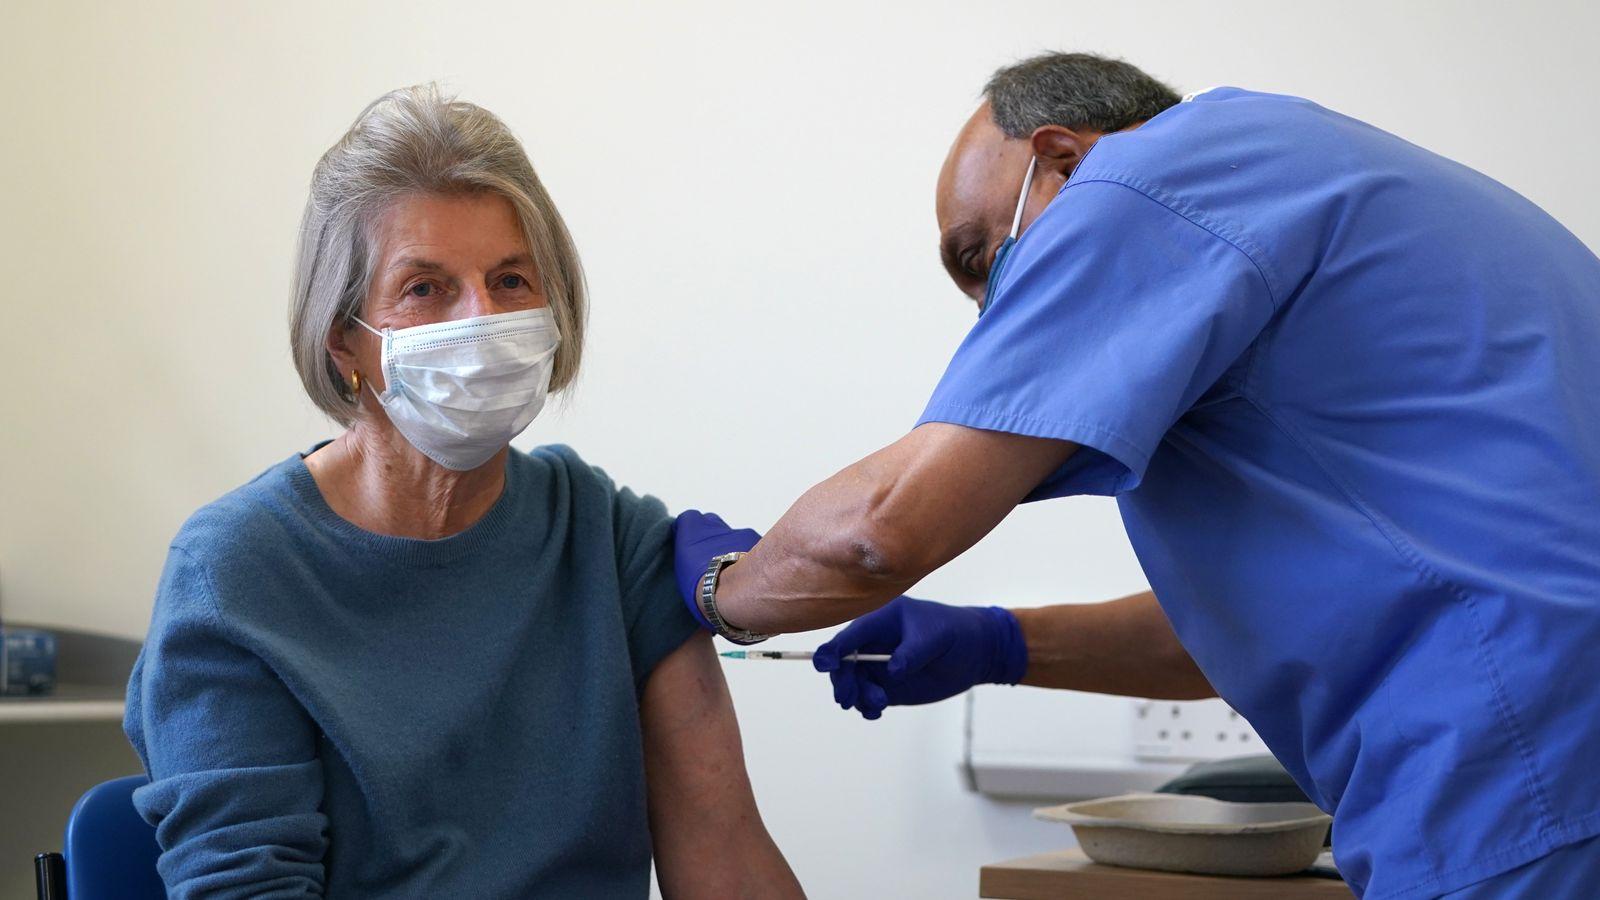 COVID-19: Boris Johnson urges those eligible to get coronavirus booster jabs this winter